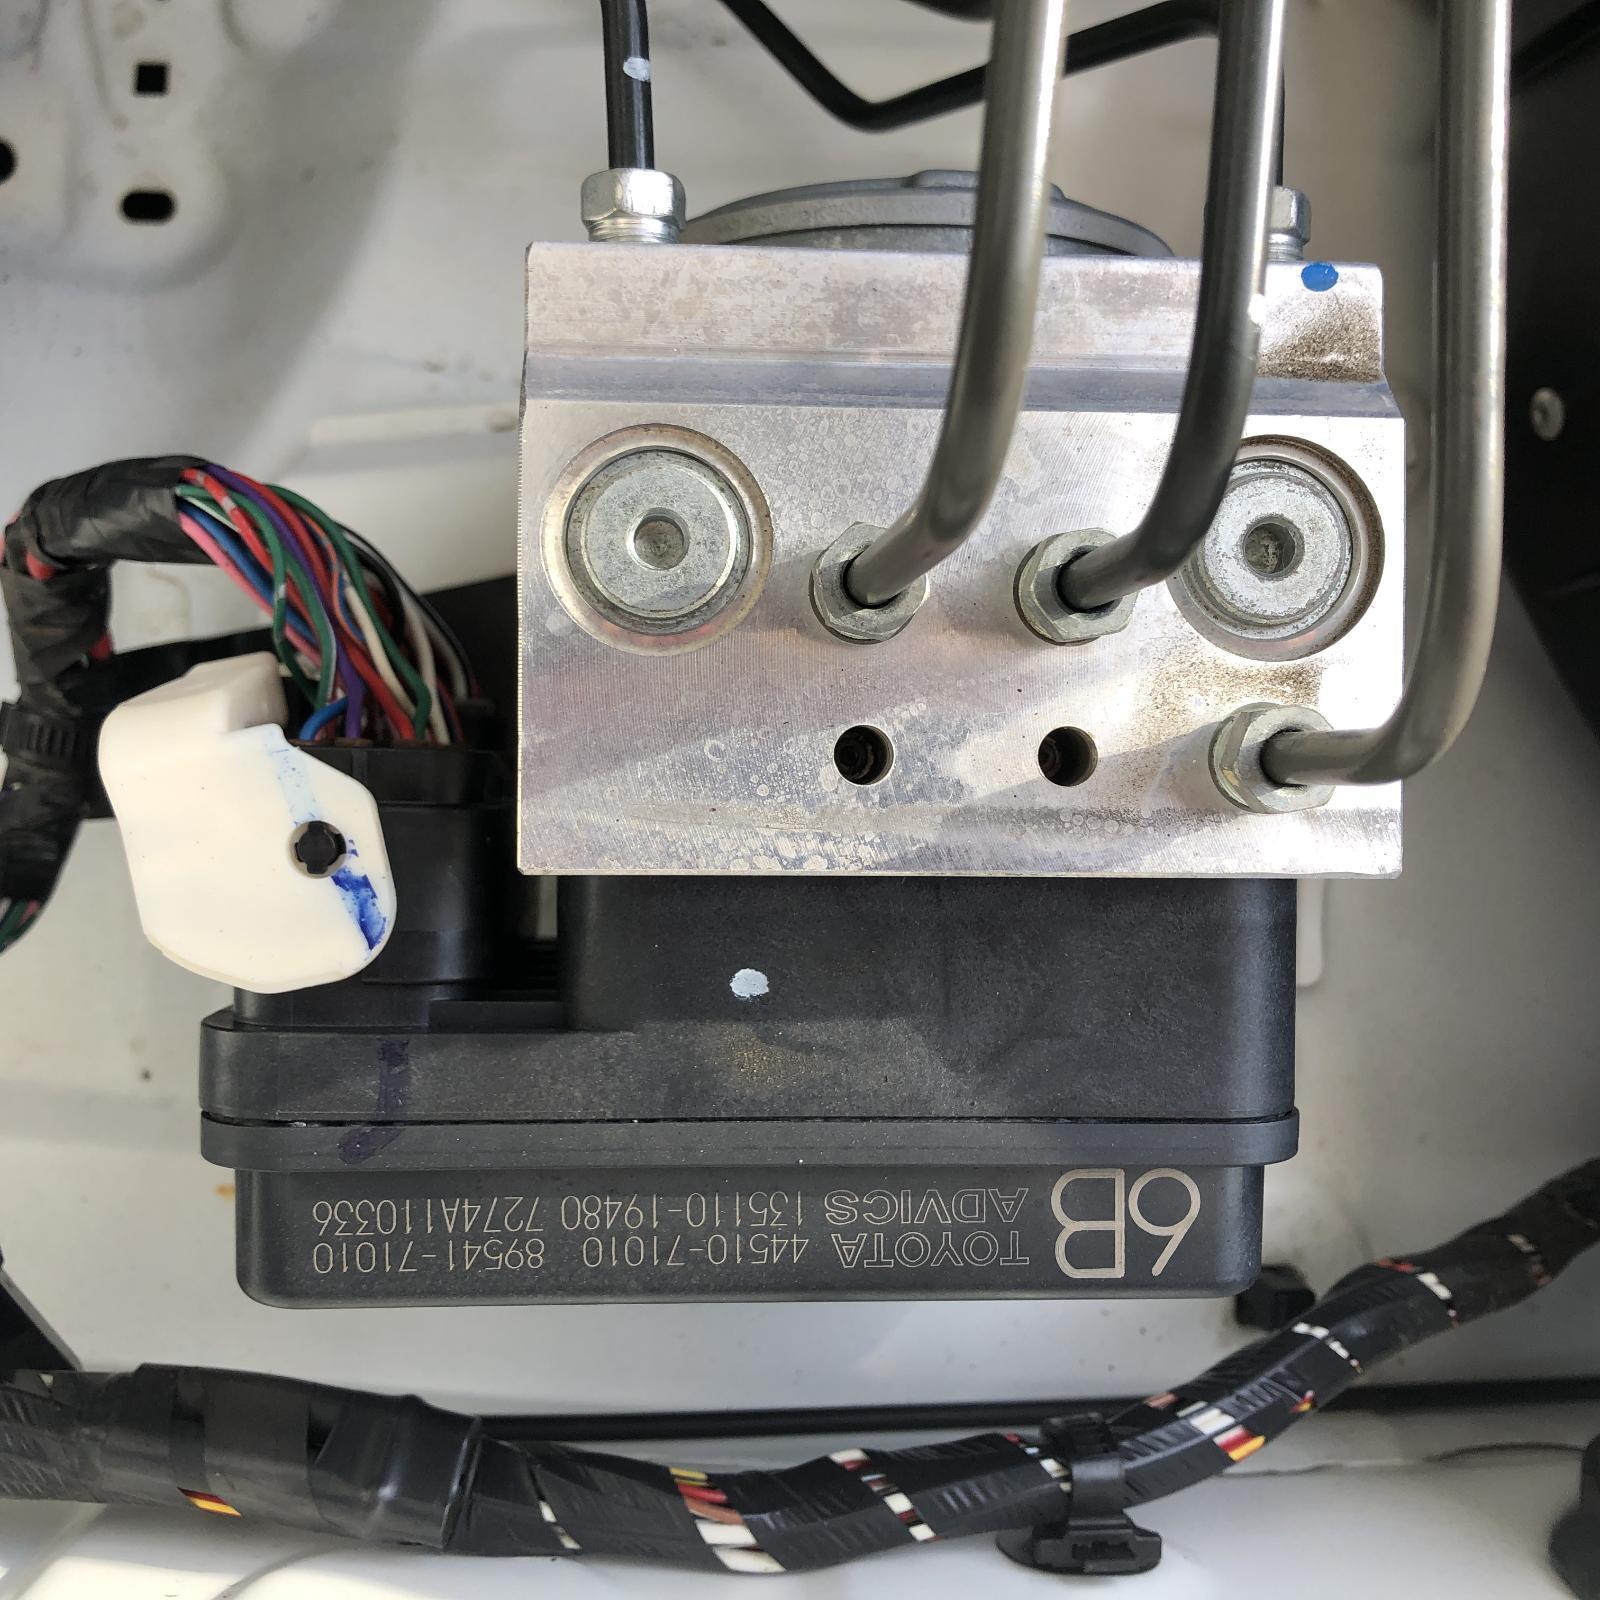 TOYOTA HILUX, Abs Pump/Modulator, P/N 4451071010, 03/05-08/15